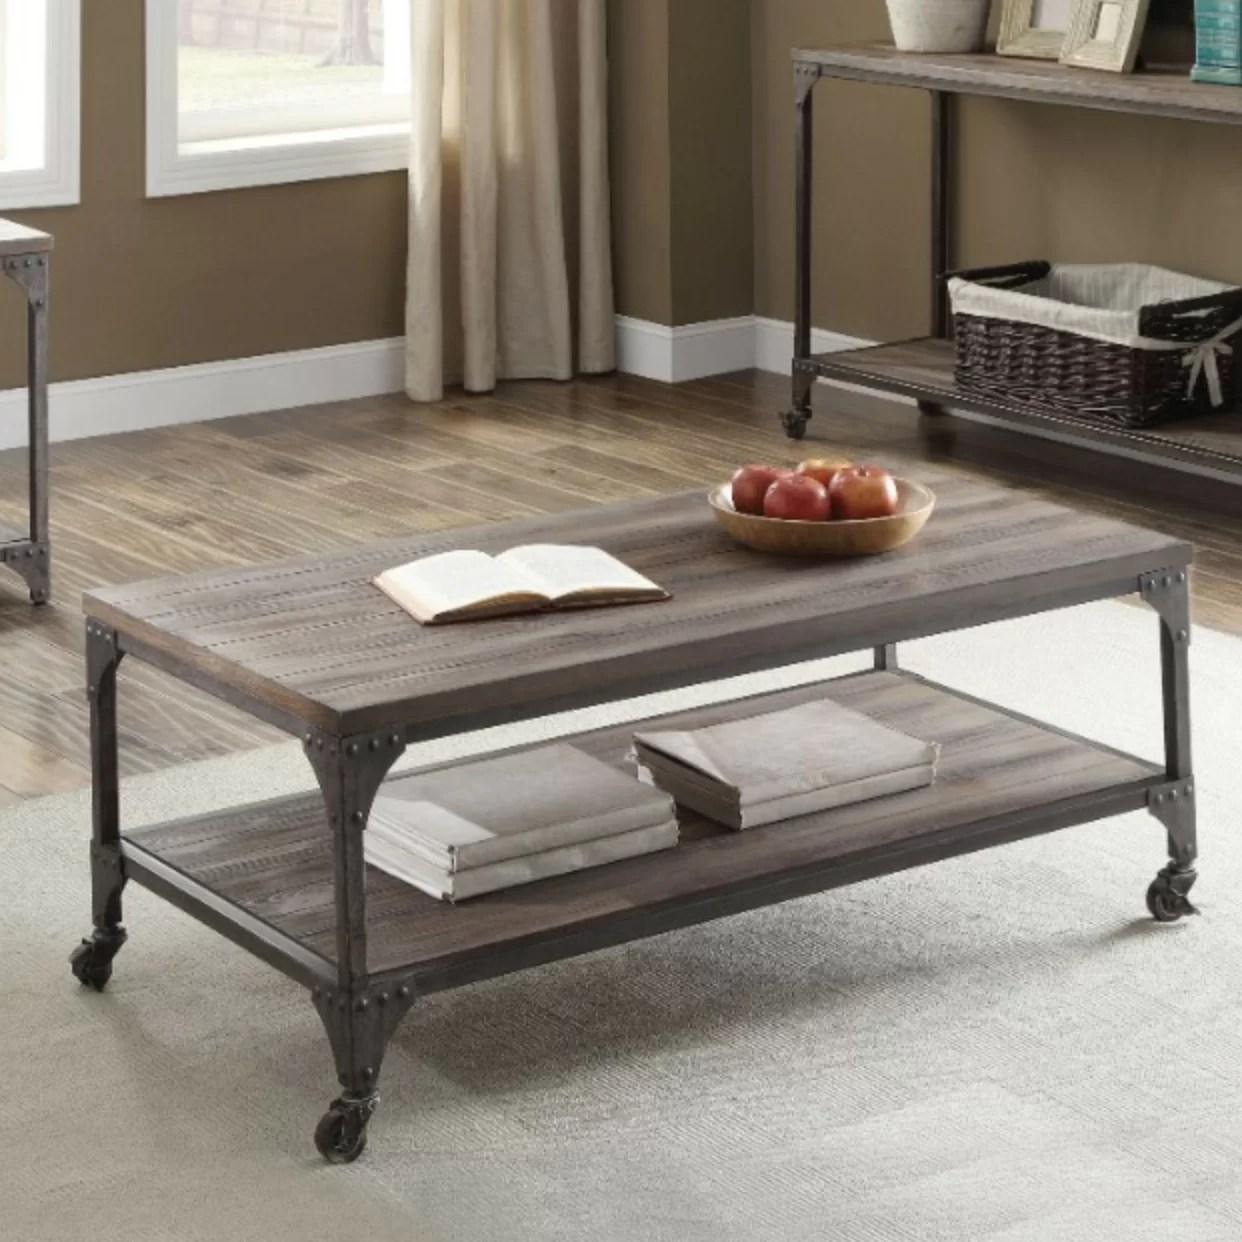 camas industrial rectangular wood and metal coffee table